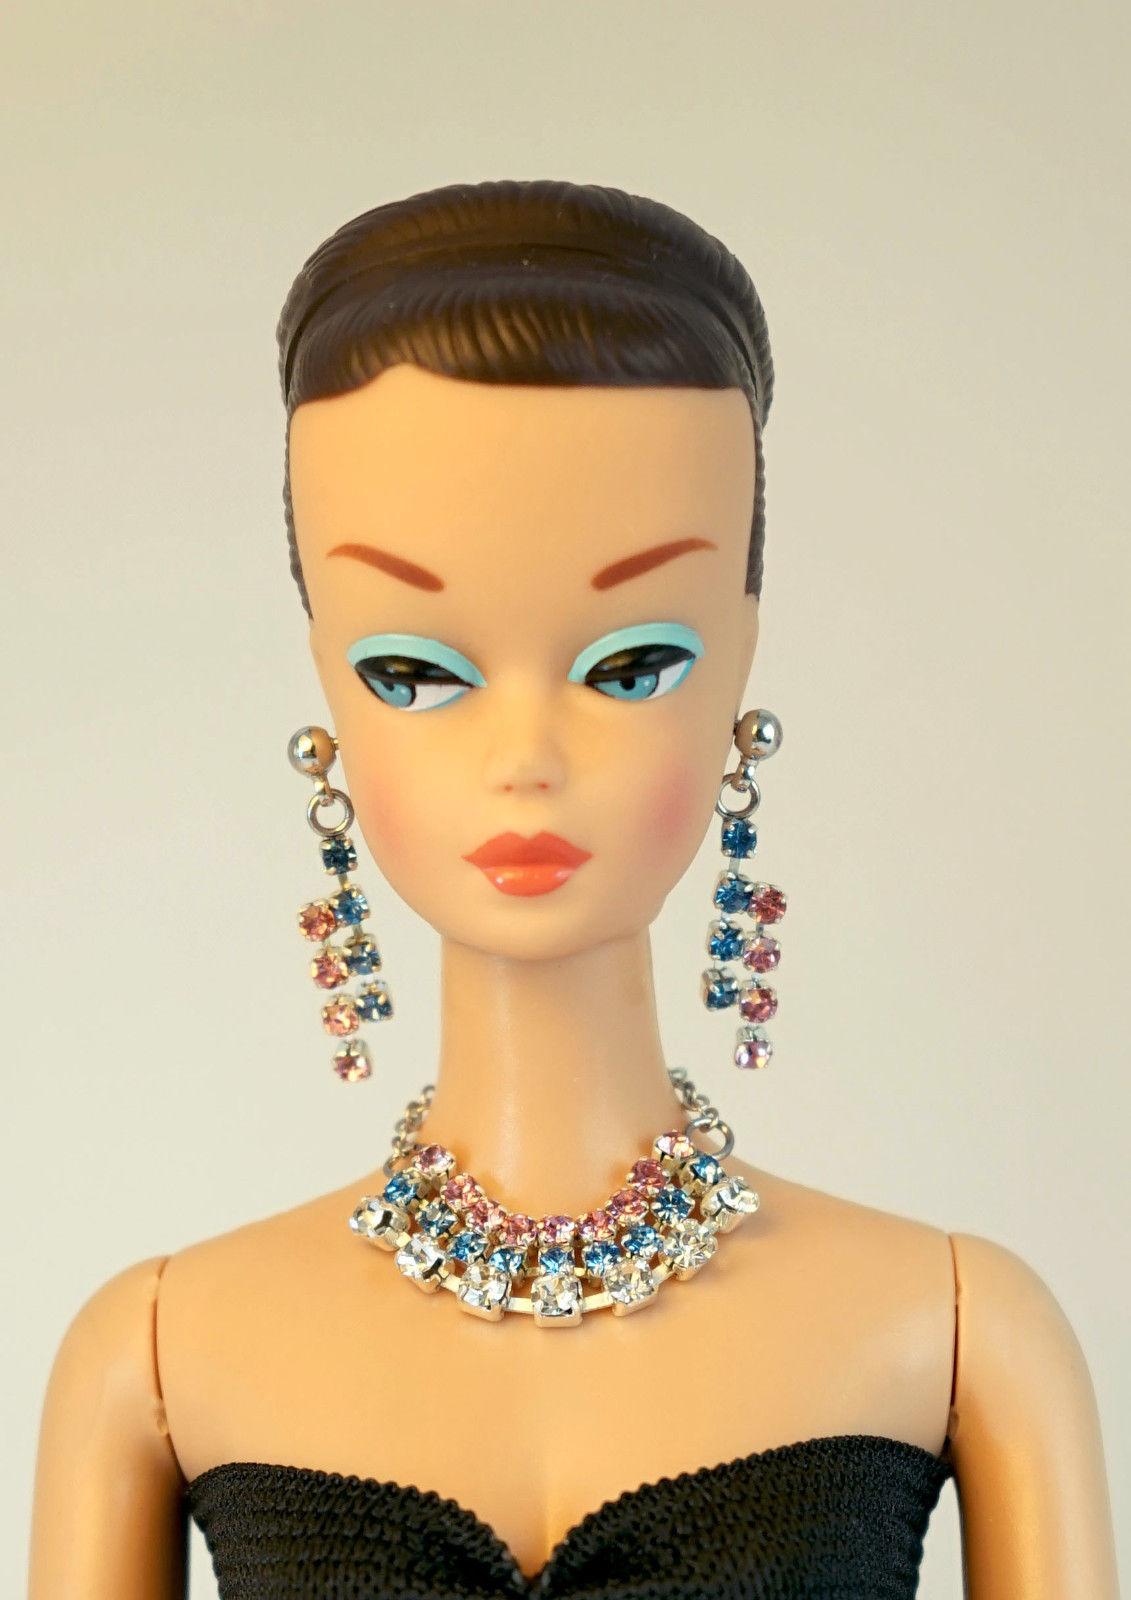 Barbie Doll Vintage Handmade Light Blue Necklace Earrings Jewelry Set NE100112